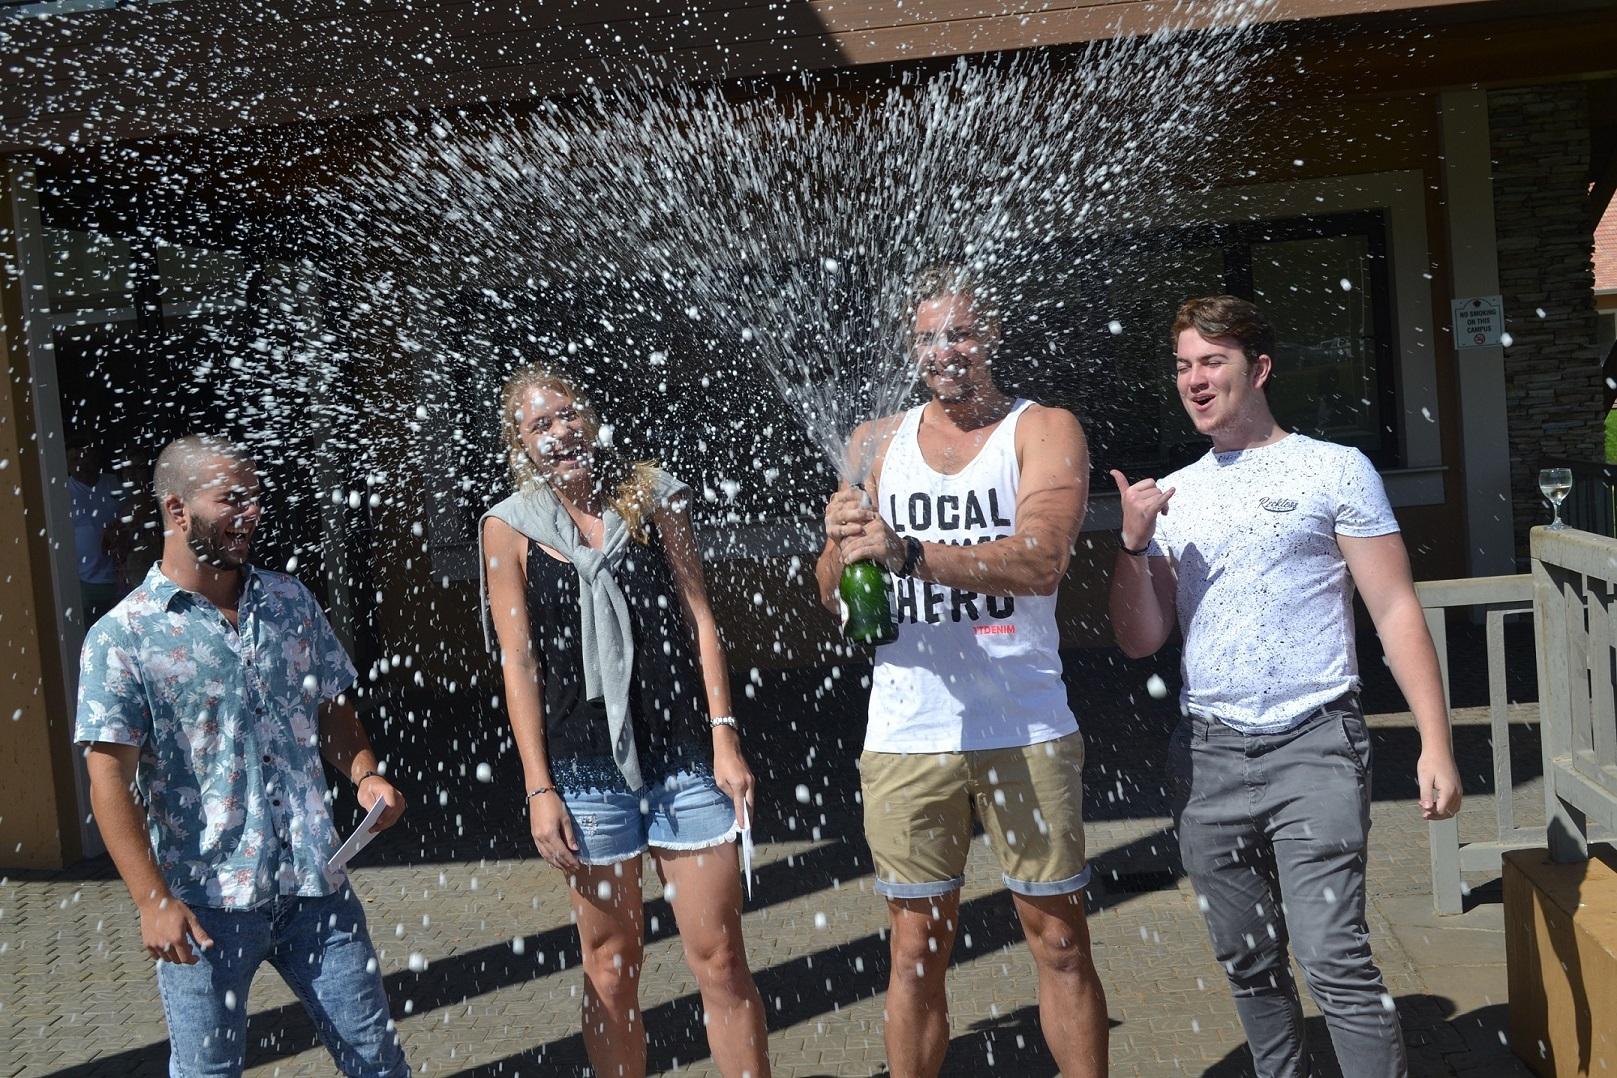 Hard work pays off! Regan Sharp, Danelle van der Linde, Ceagan Scott and Dylan Hugo pop the champagne in celebration of their matric results.